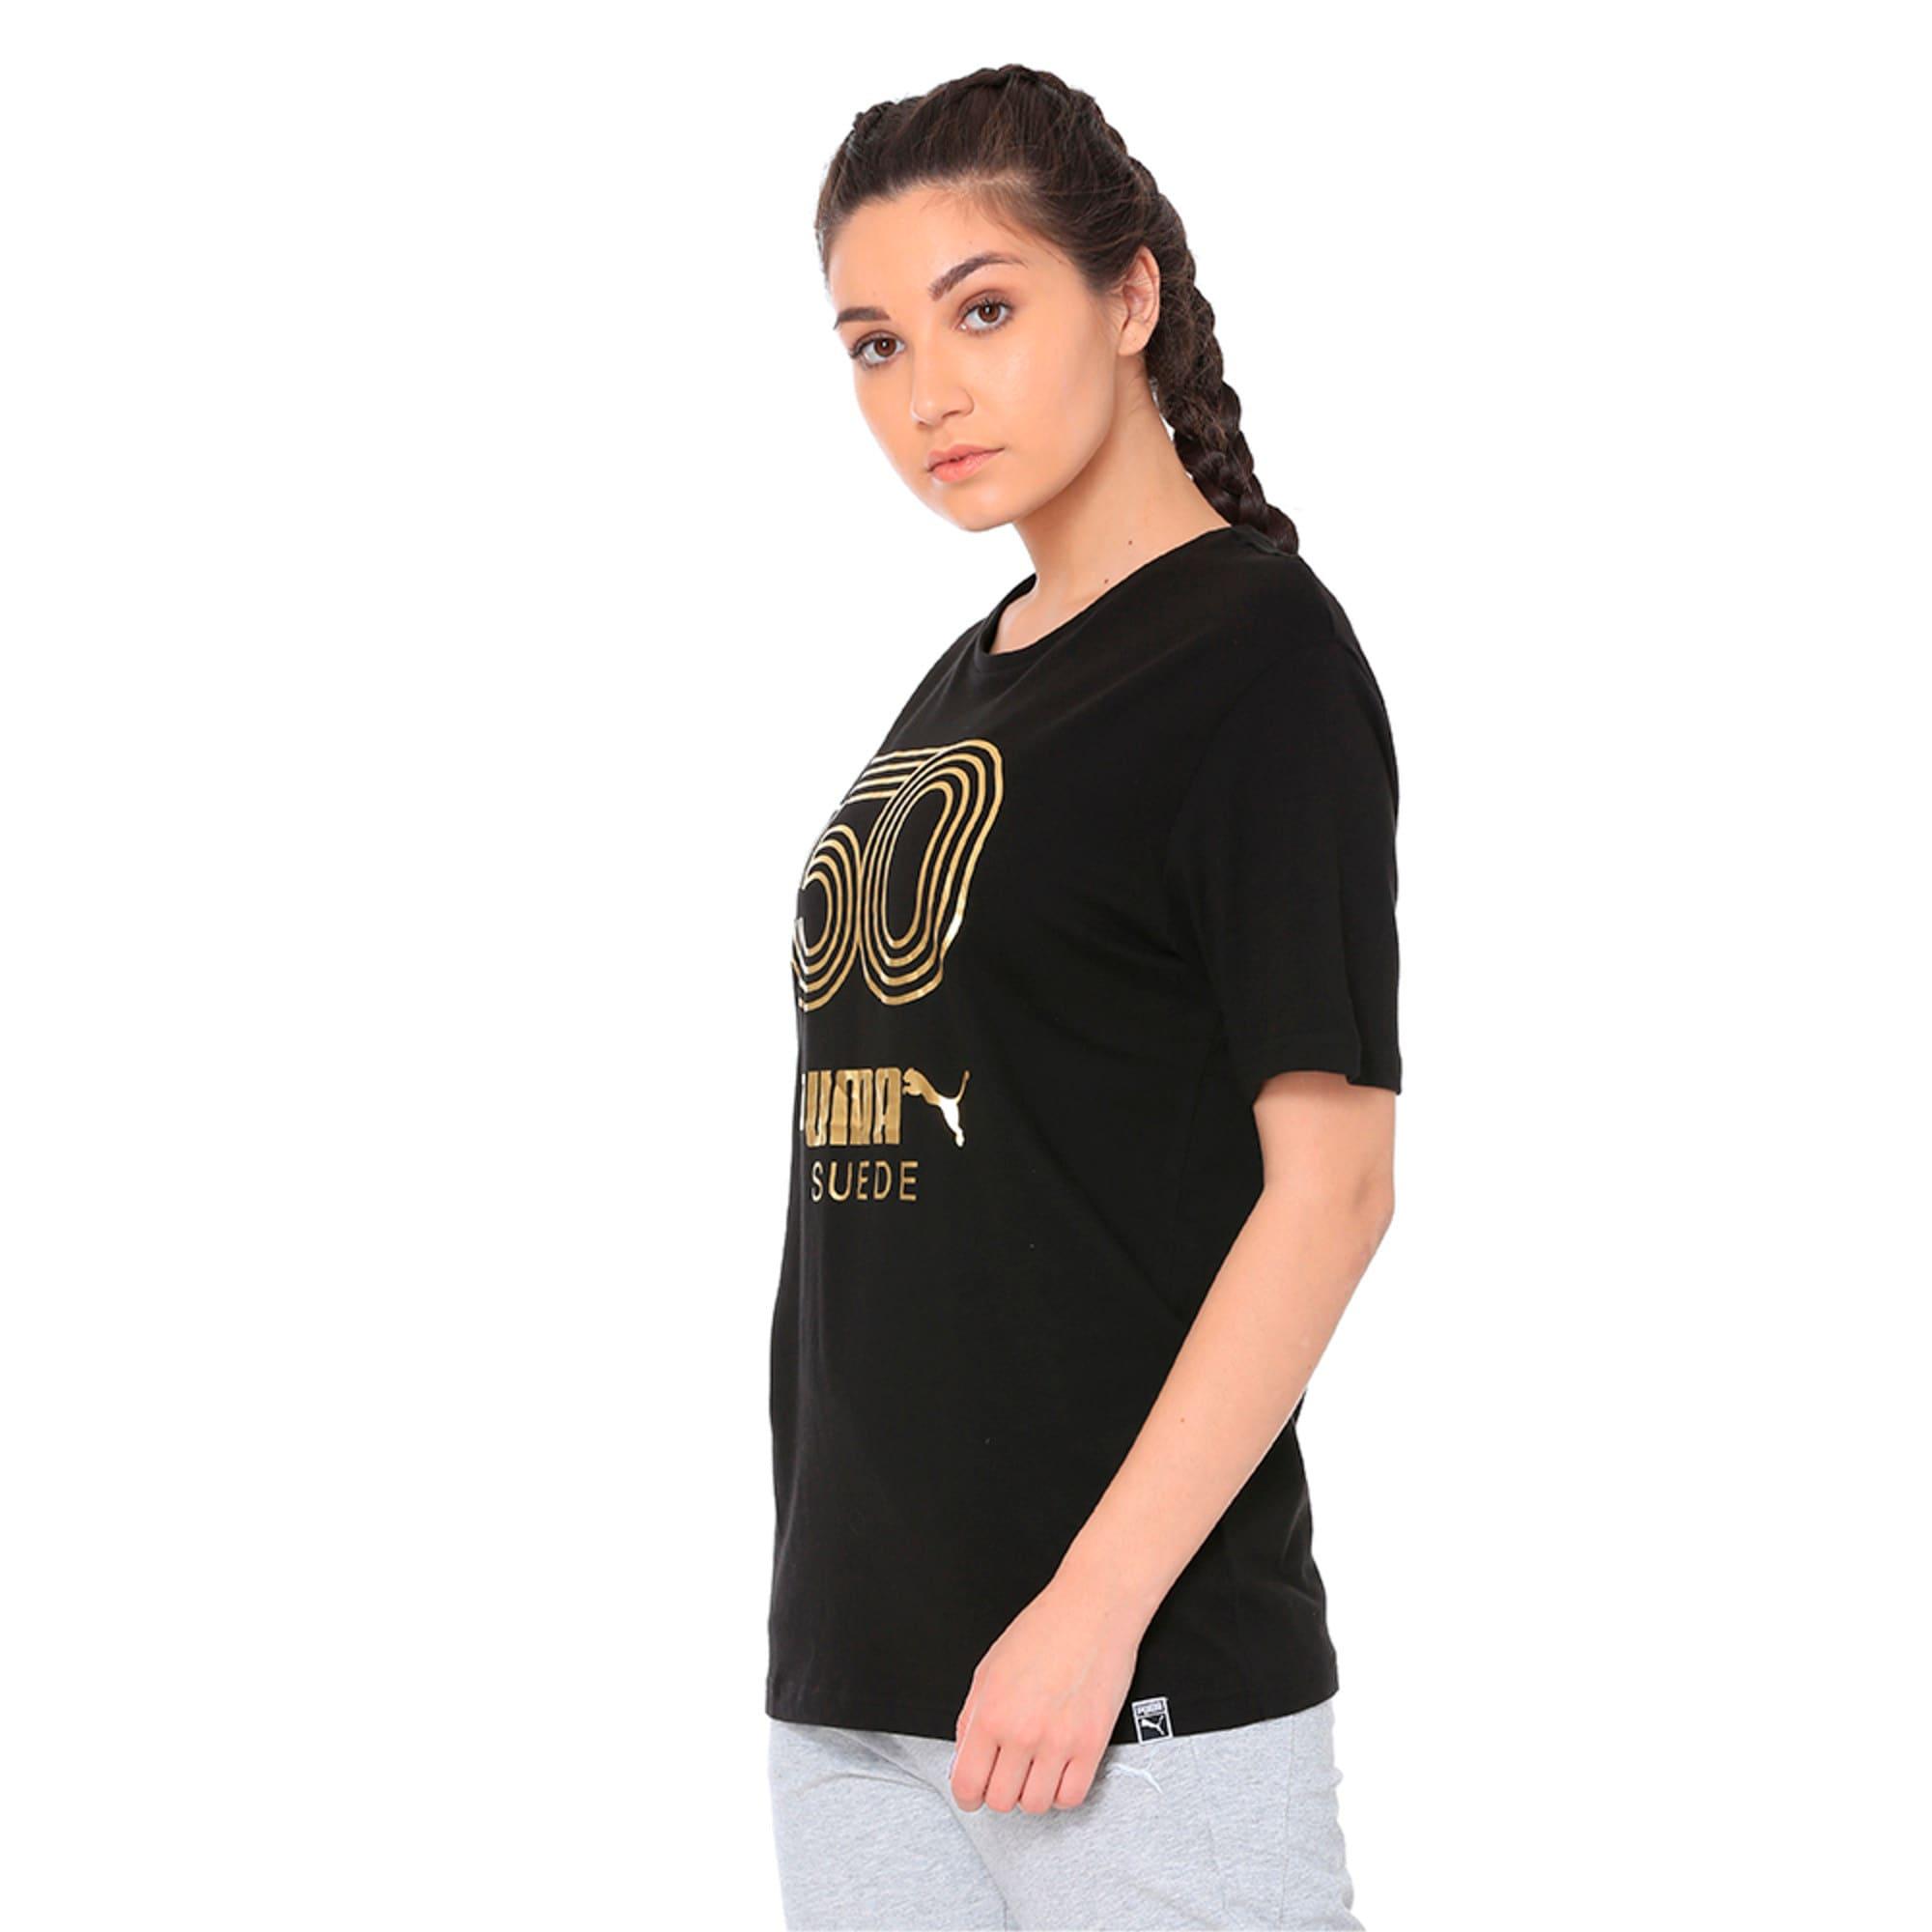 Thumbnail 3 of Women's Graphic T-shirt, Cotton Black, medium-IND